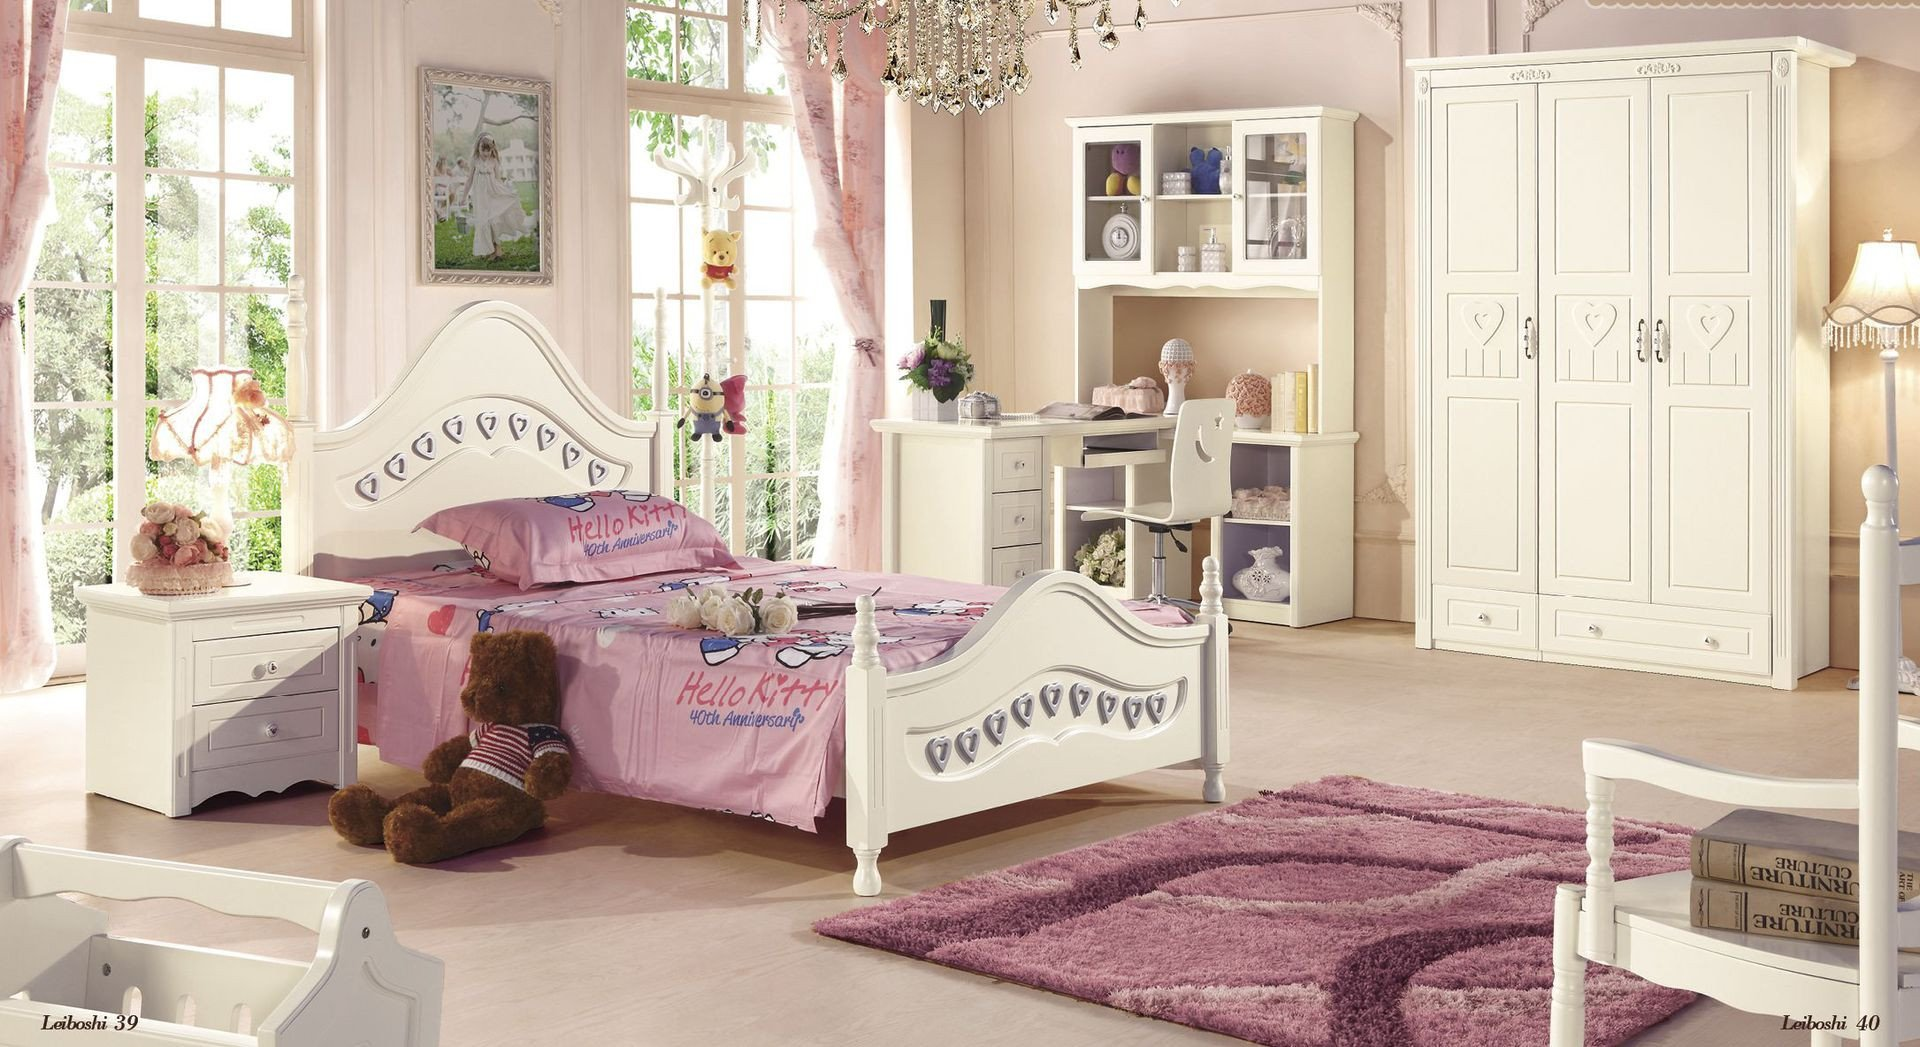 Solid Oak Bedroom Furniture Beautiful solid Wood Bedroom Furniture for Kids